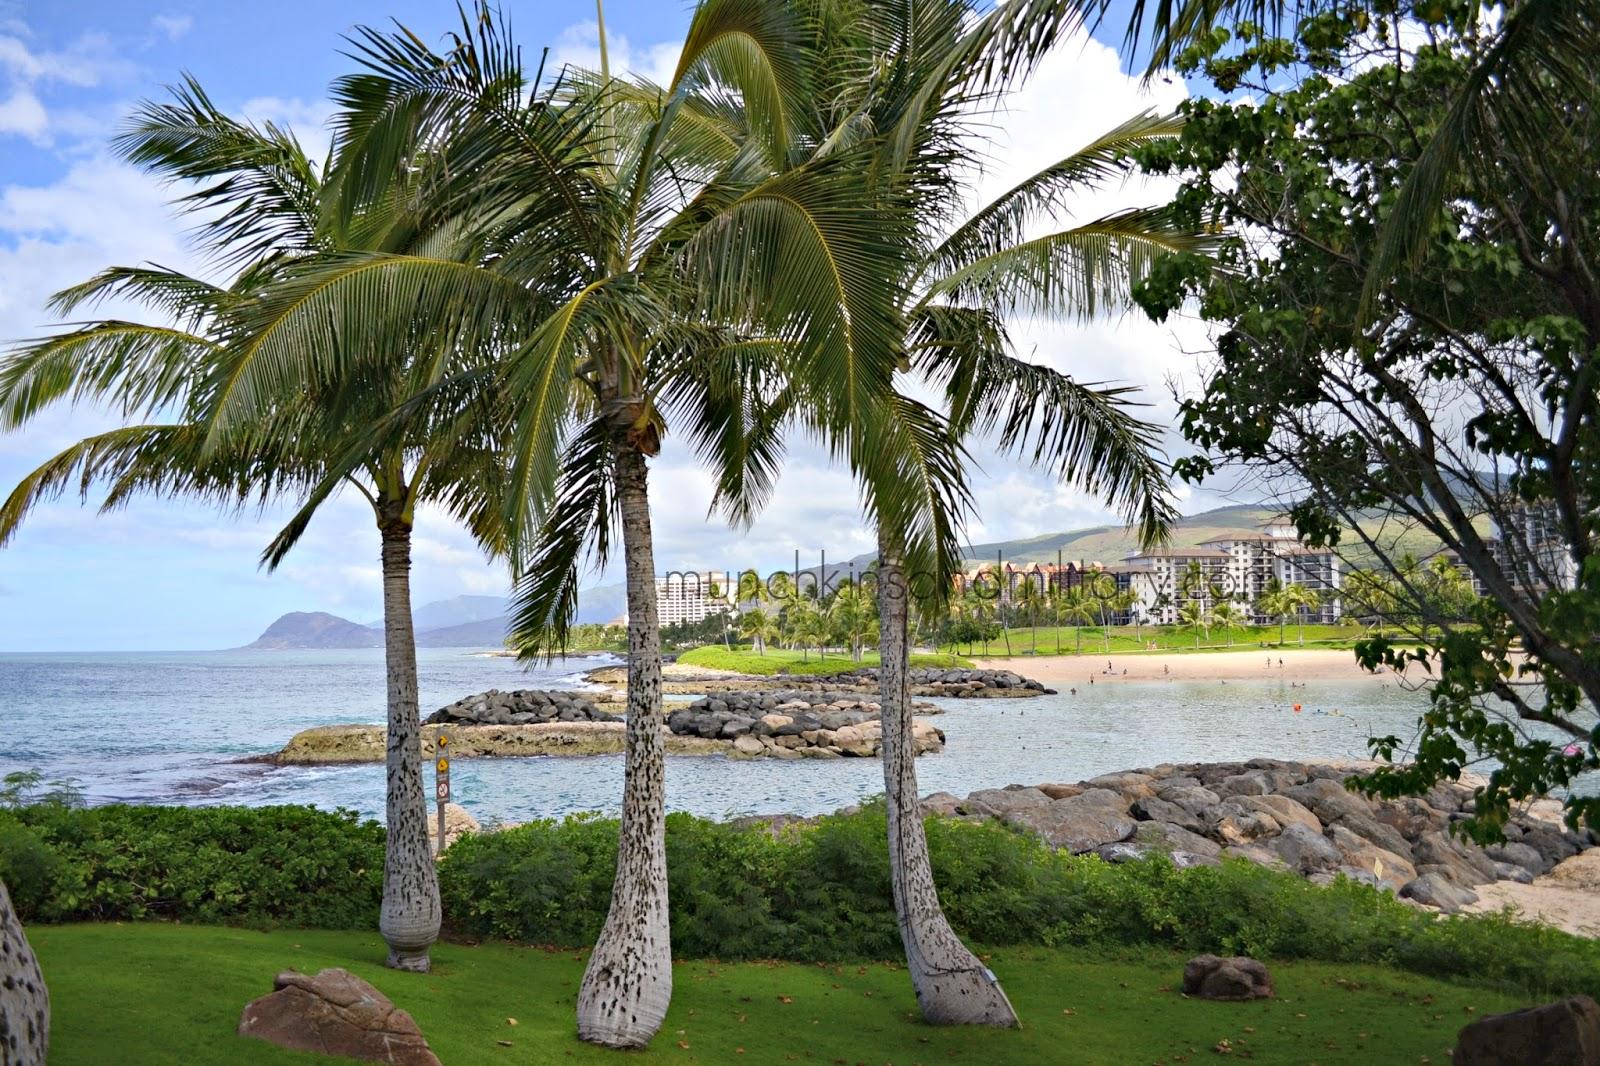 Palm trees at the Koolina Lagoons, Oahu, Hawaii